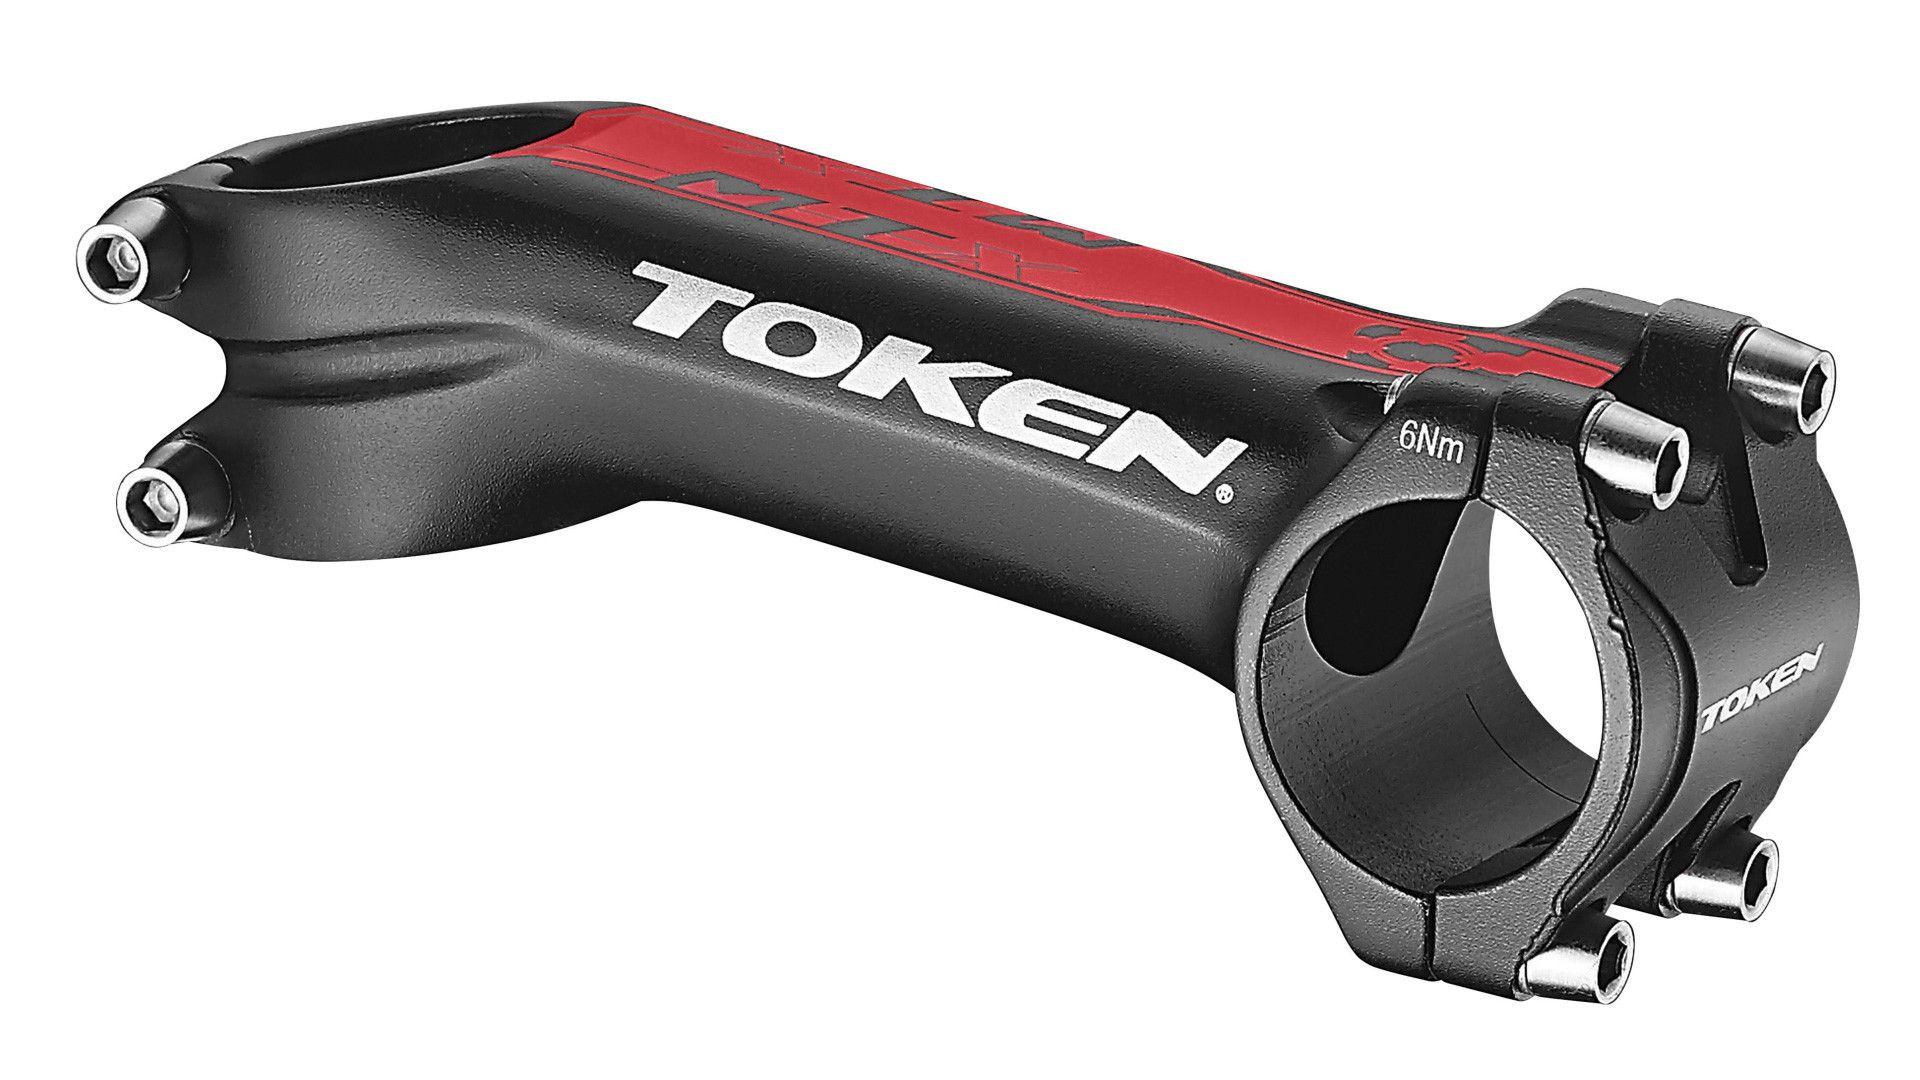 Avanço Mesa Token Pro Tk9320 Red Bike 100mm 20Graus